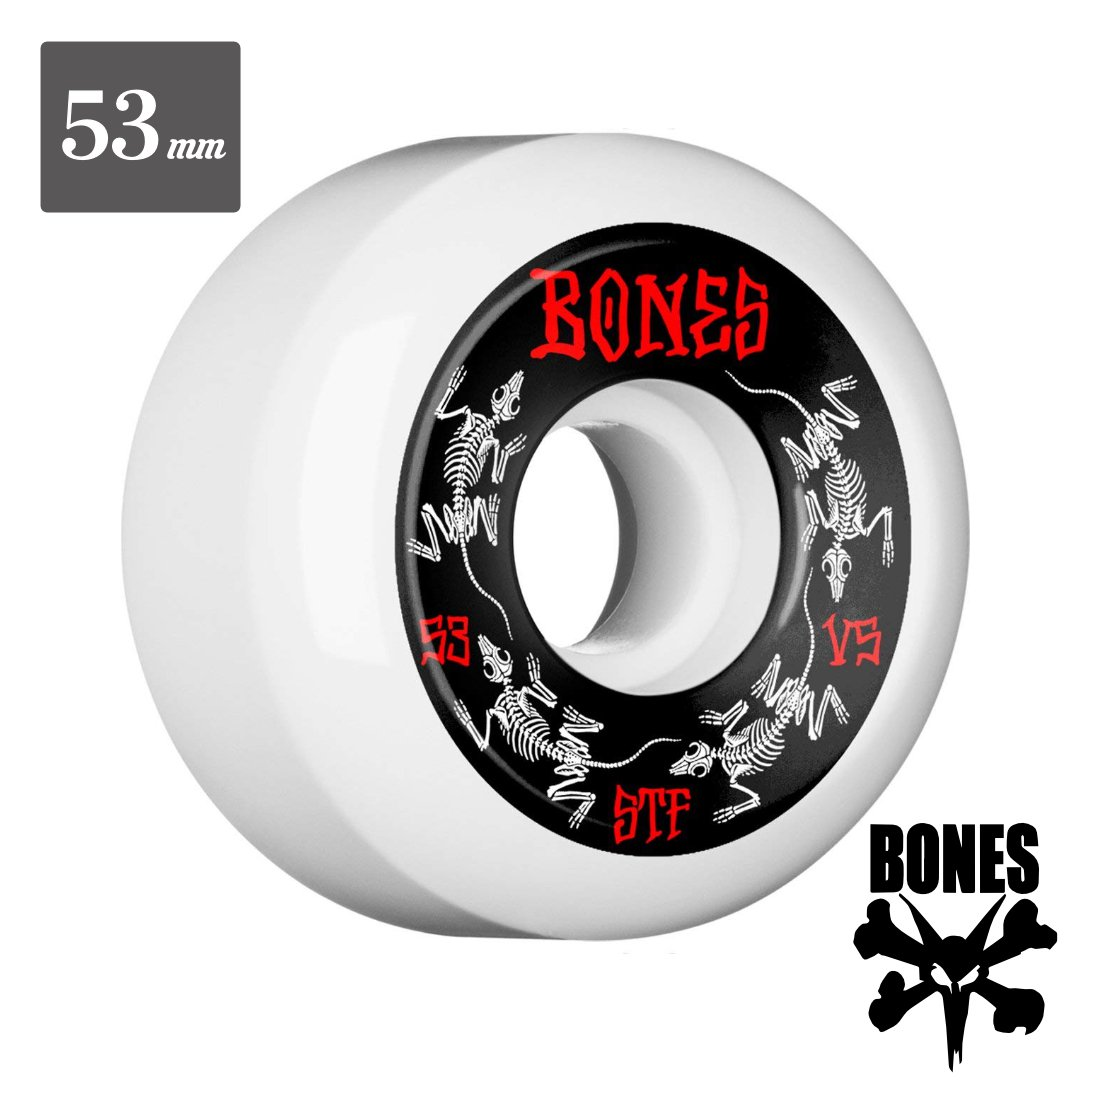 【BONES WHEEL】STF 2017 CONICAL